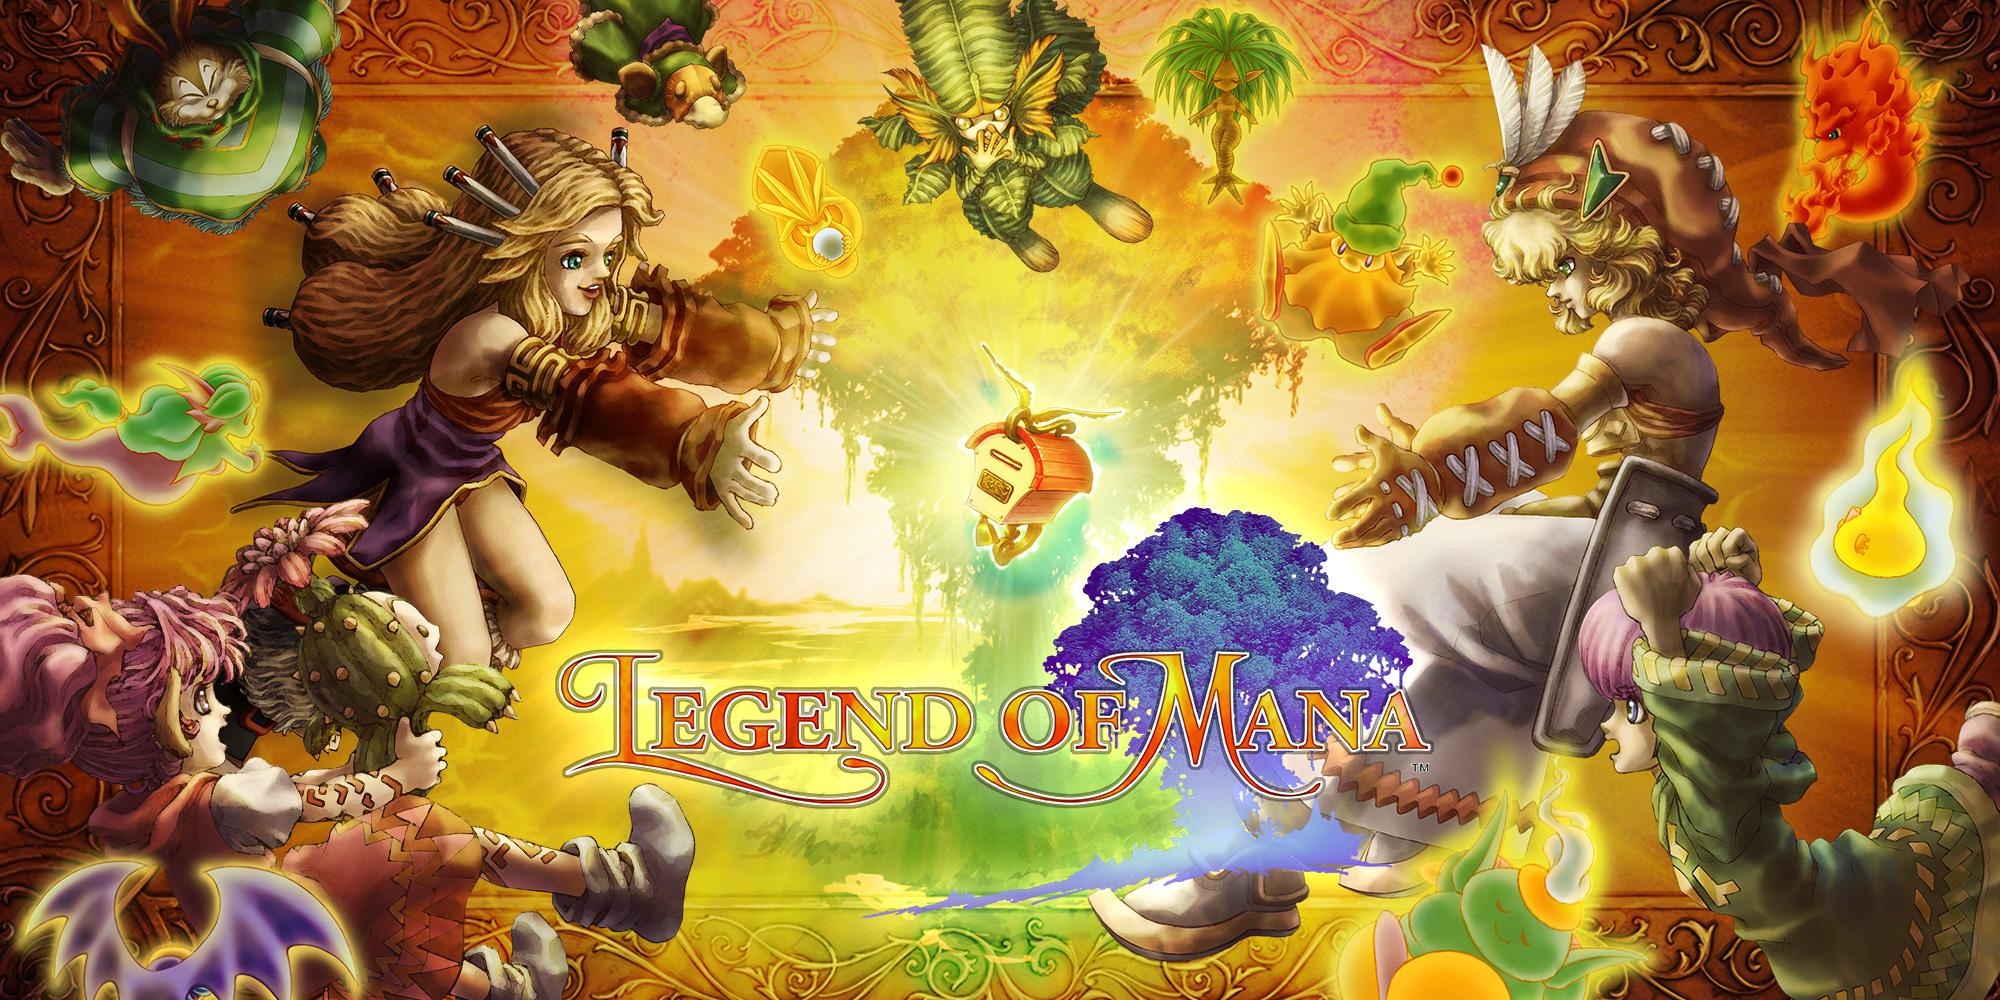 Legend of Mana HD Remastered ตำนาน RPG กลับมาอีกหนึ่ง